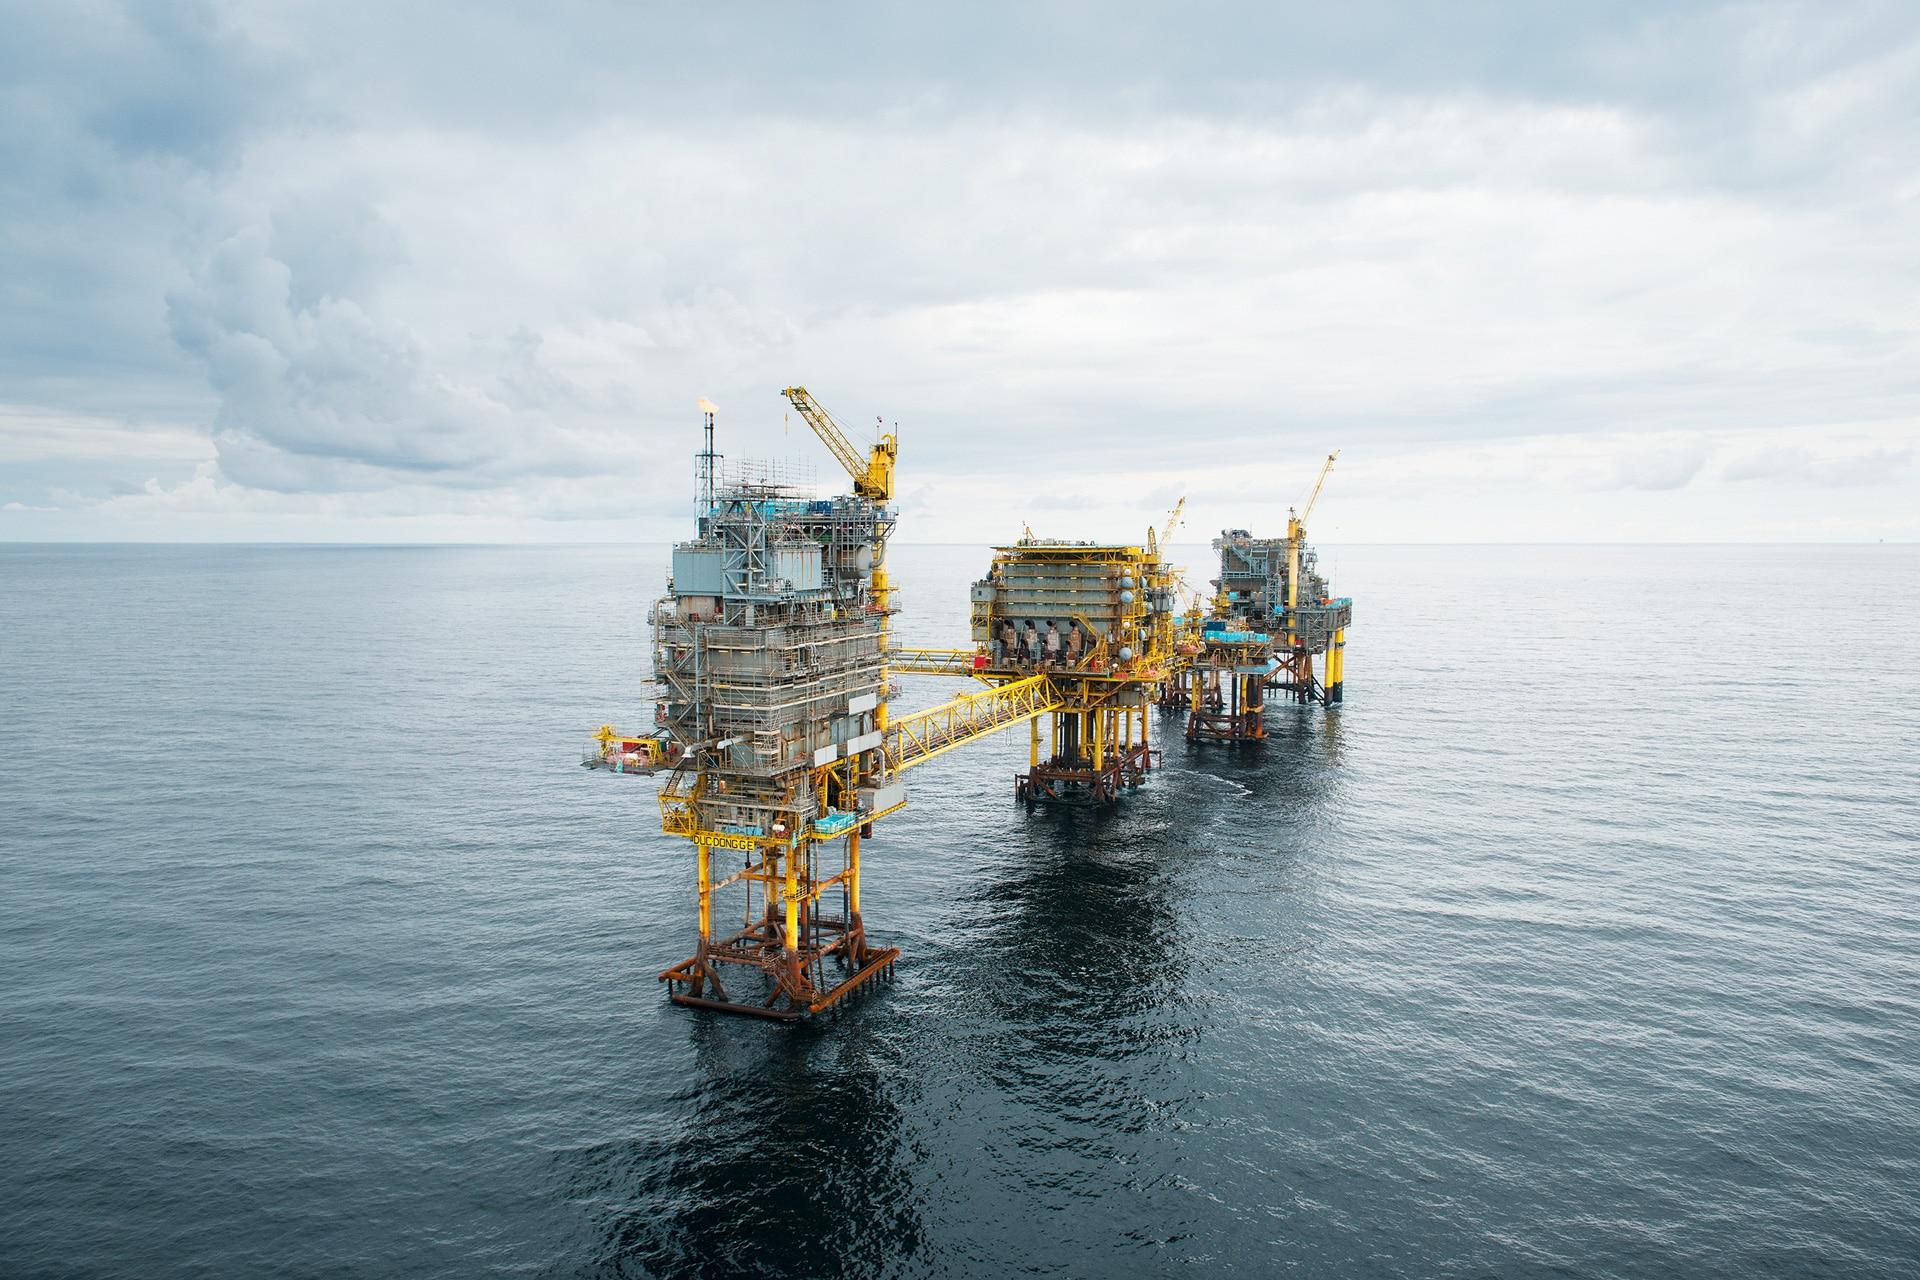 Maersk Decorating, by Photographer Morten Larsen